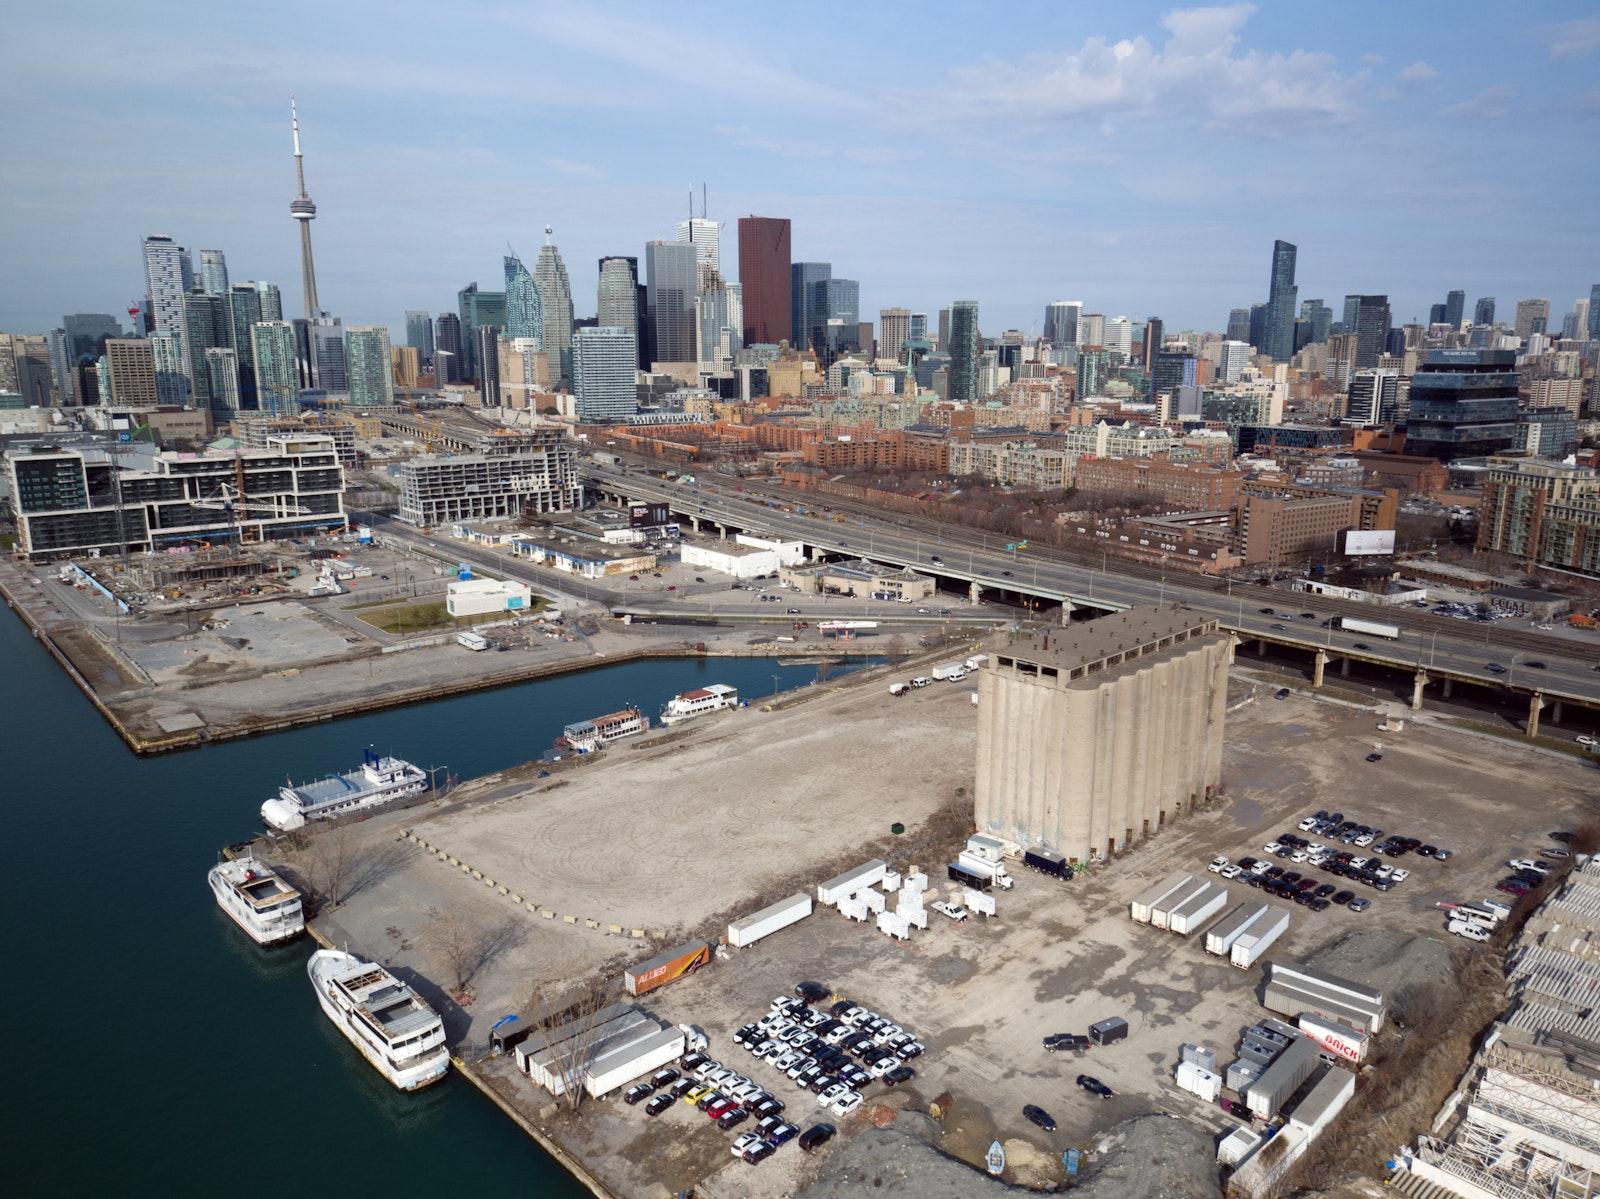 The site of the planned Sidewalk Labs development in Toronto. Photo: Sidewalk Labs